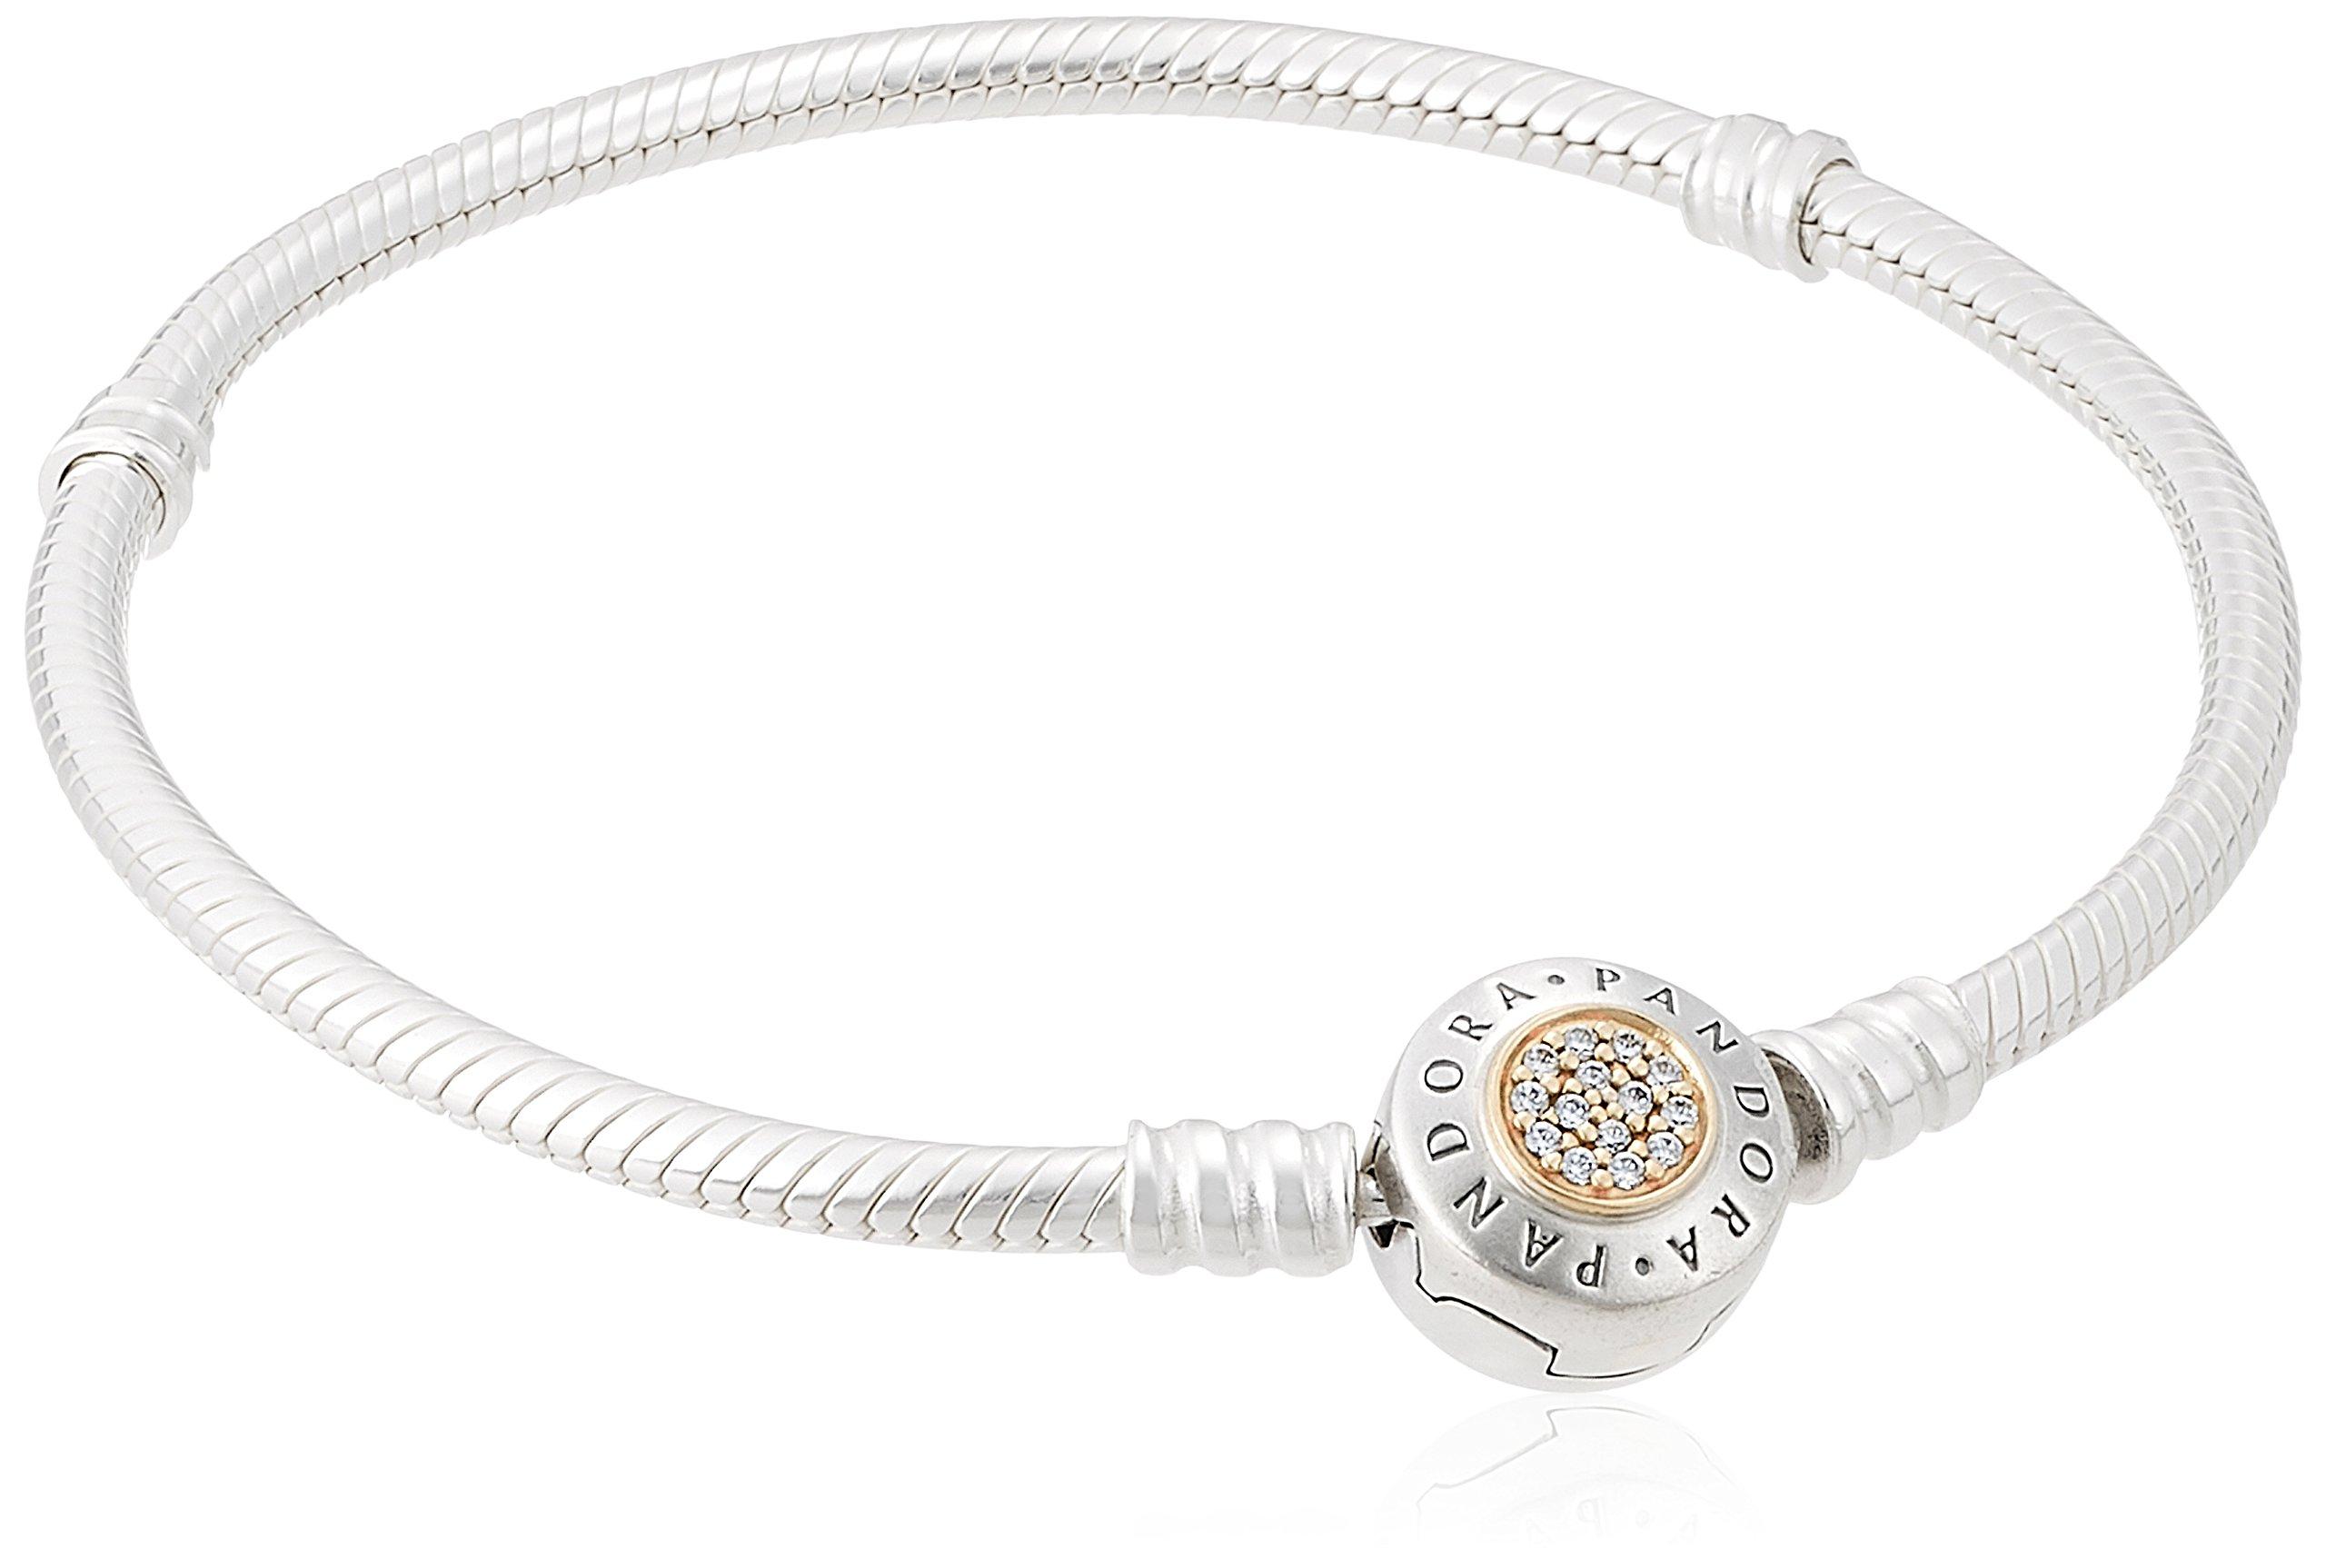 PANDORA-590741CZ-20-PANDORA-Signature-Two-tone-Bracelet-79-Inch